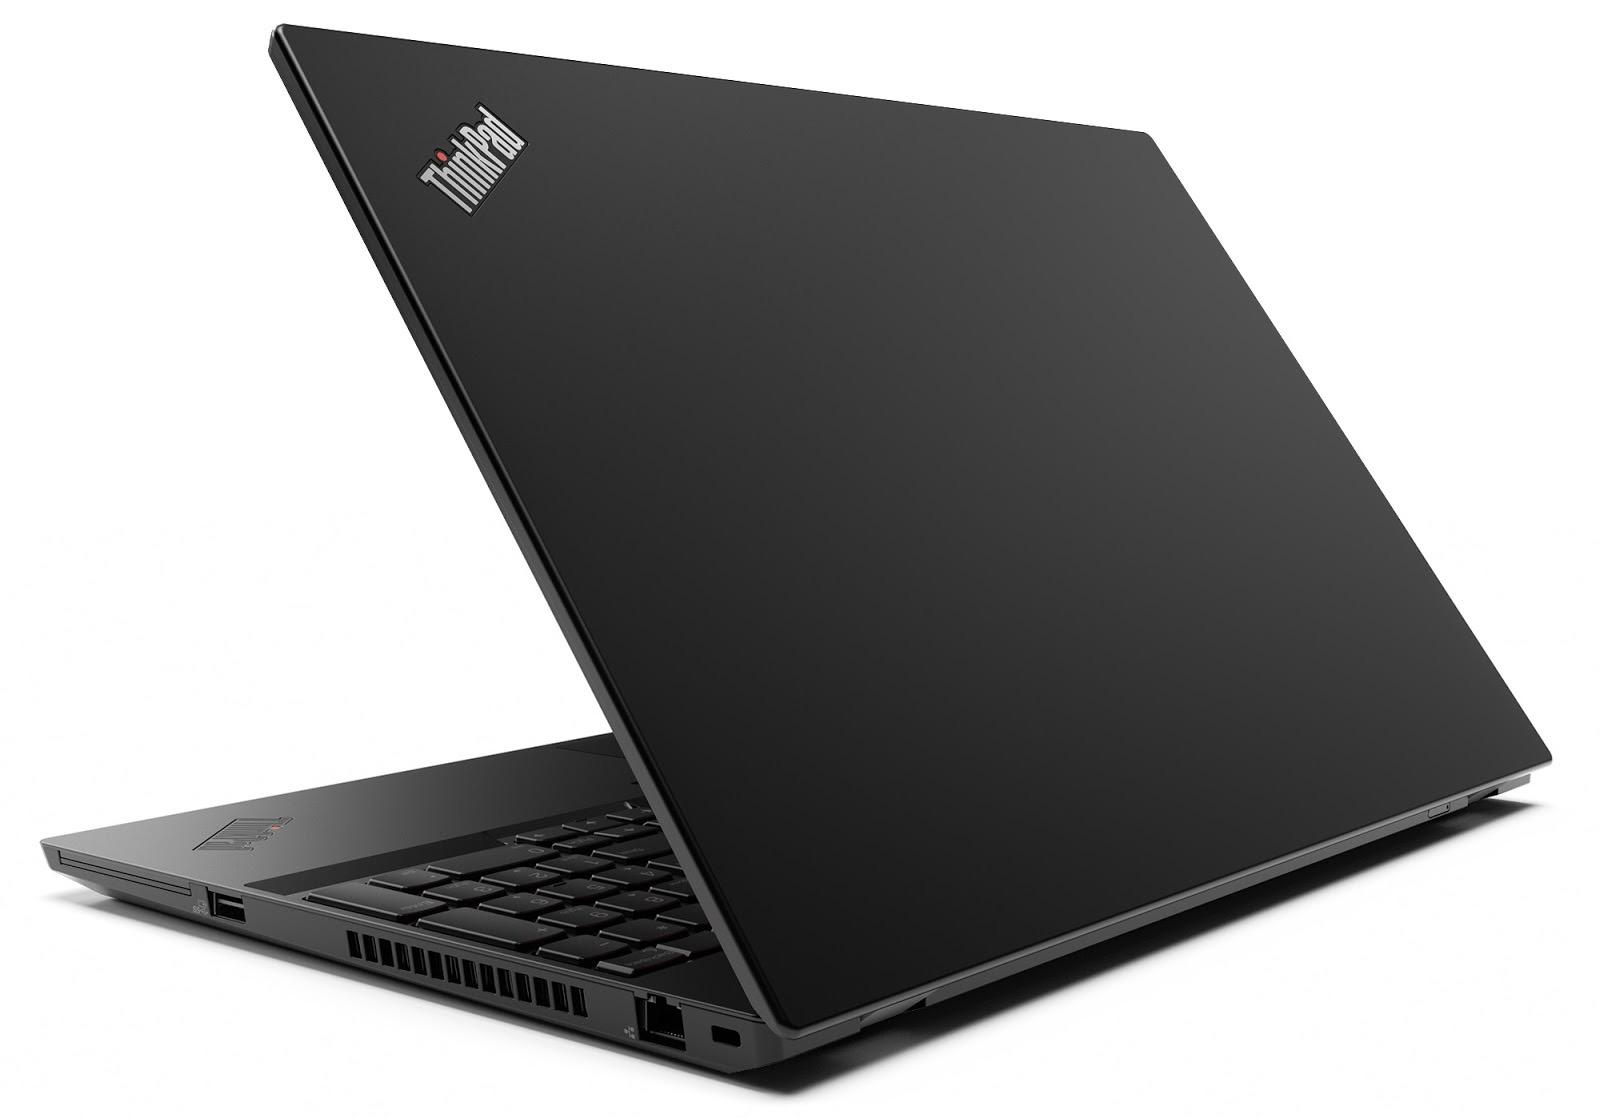 Фото 2. Ноутбук Lenovo ThinkPad T15 Gen 1 Black (20S60024RT)